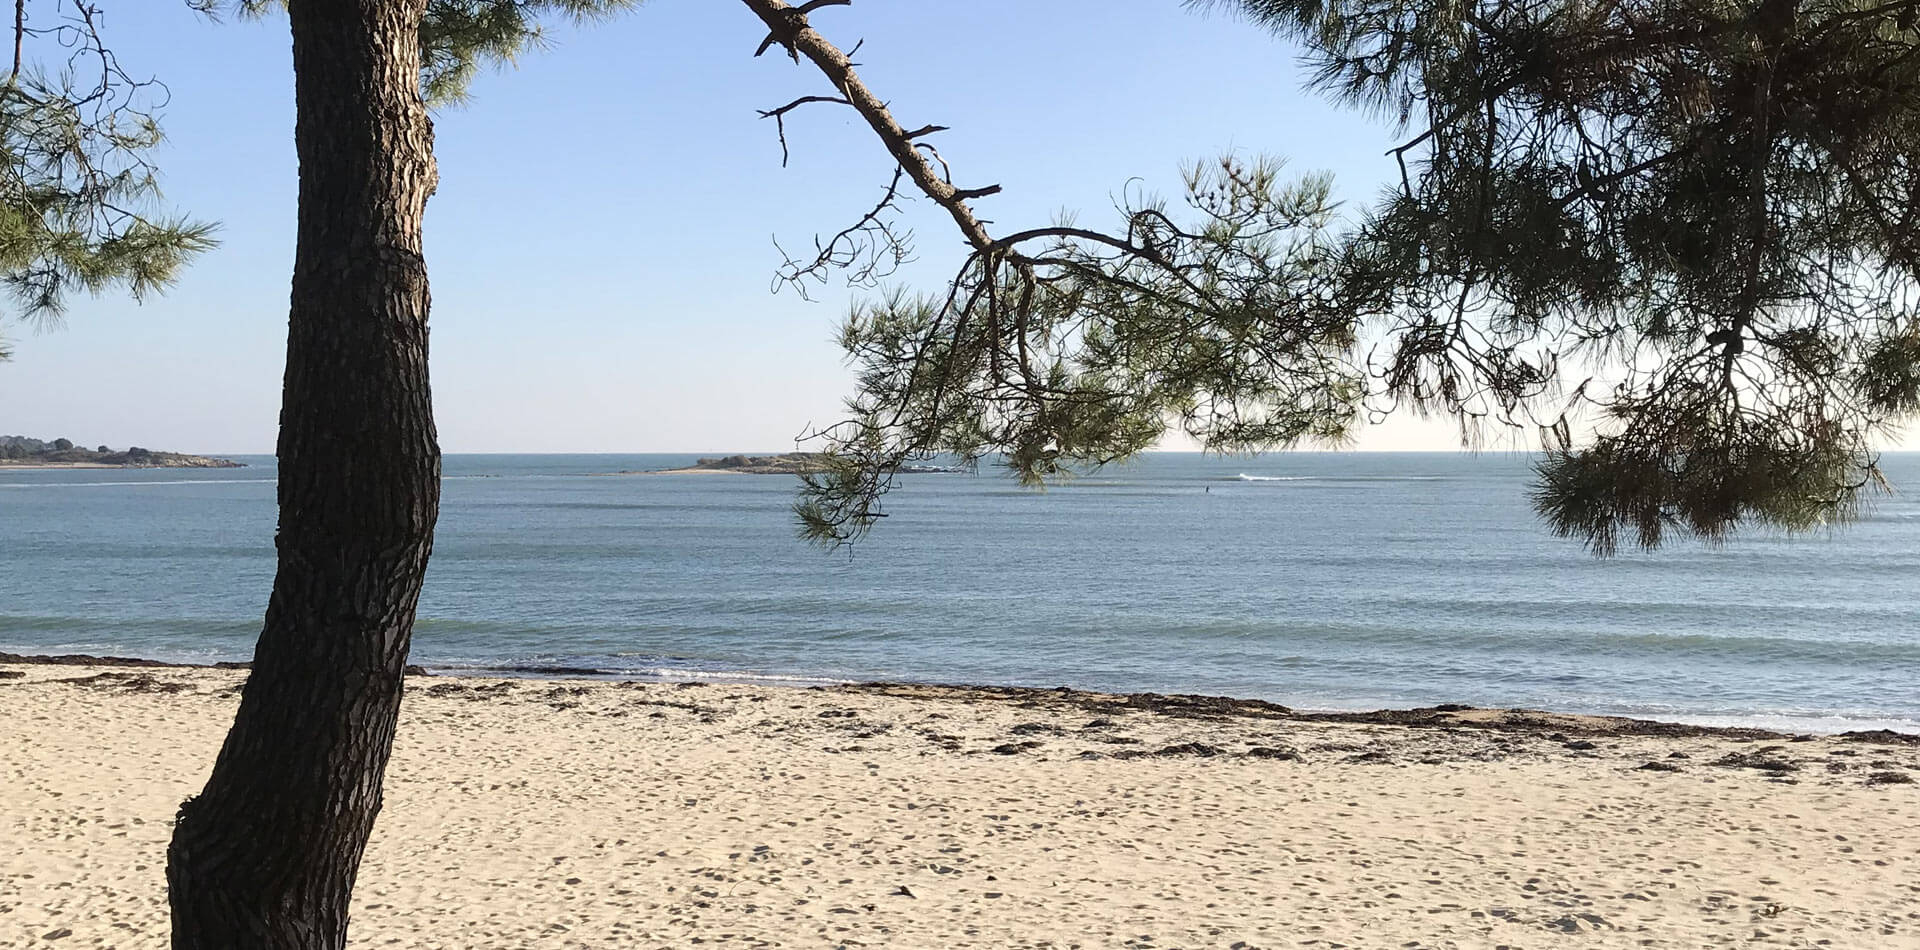 Camping Carnac - Camping Morbihan - ᐃ Le Dolmen *** concernant Camping Golf Du Morbihan Avec Piscine